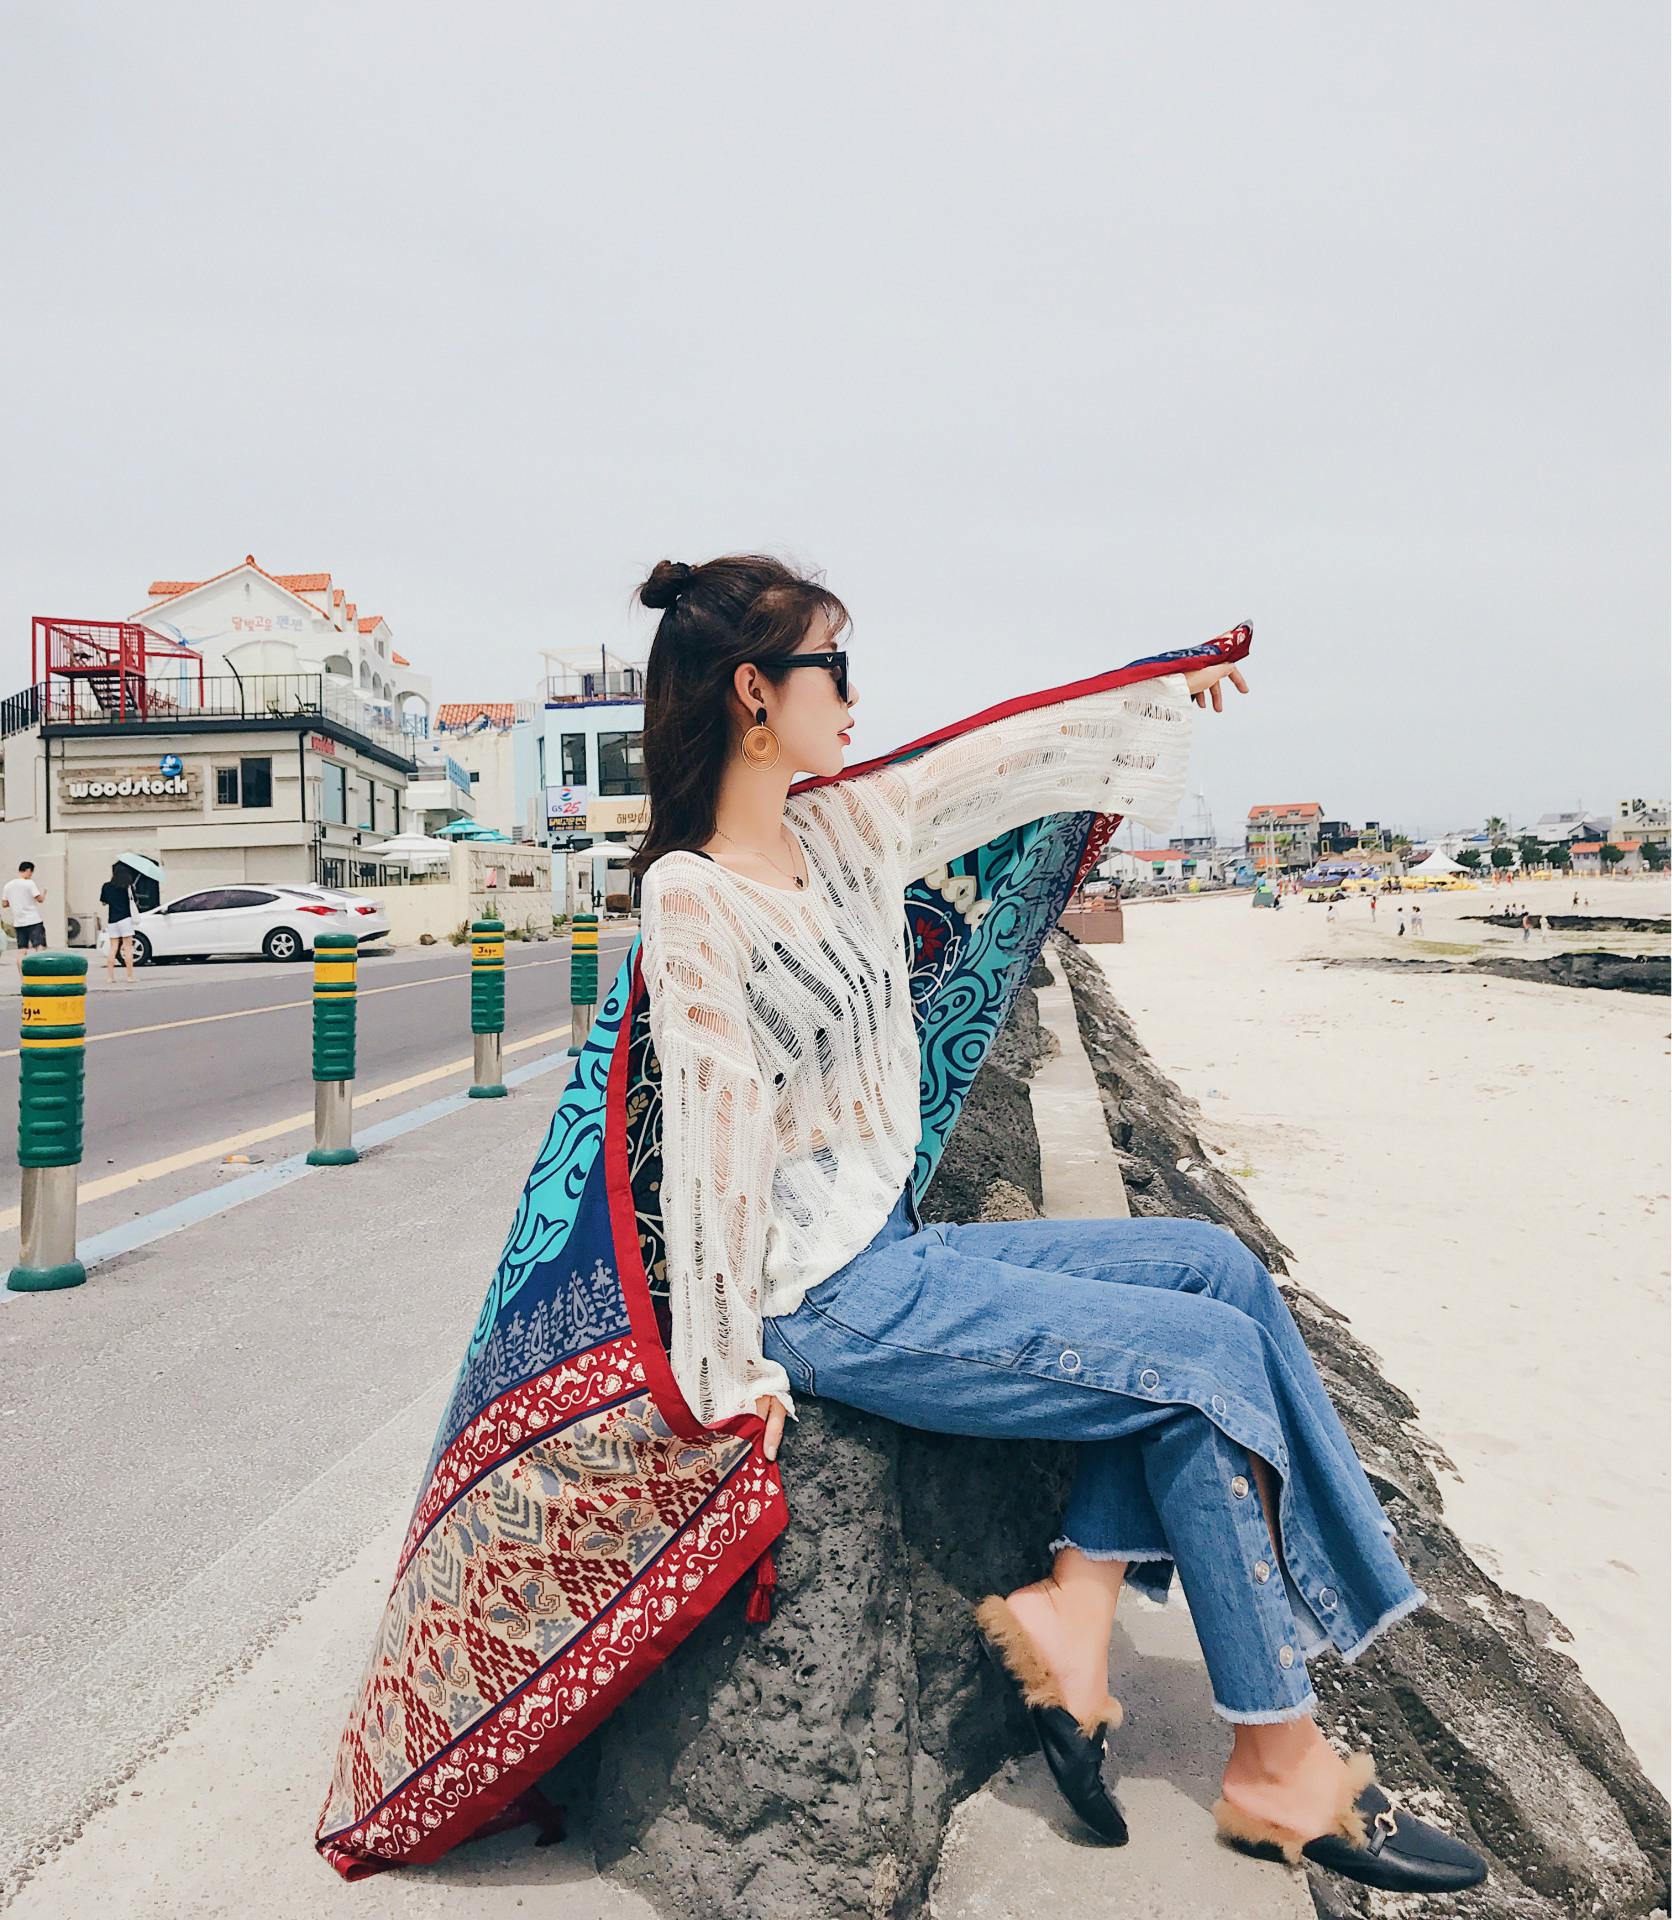 wf夏季女士海边沙滩防晒披肩围巾优惠券